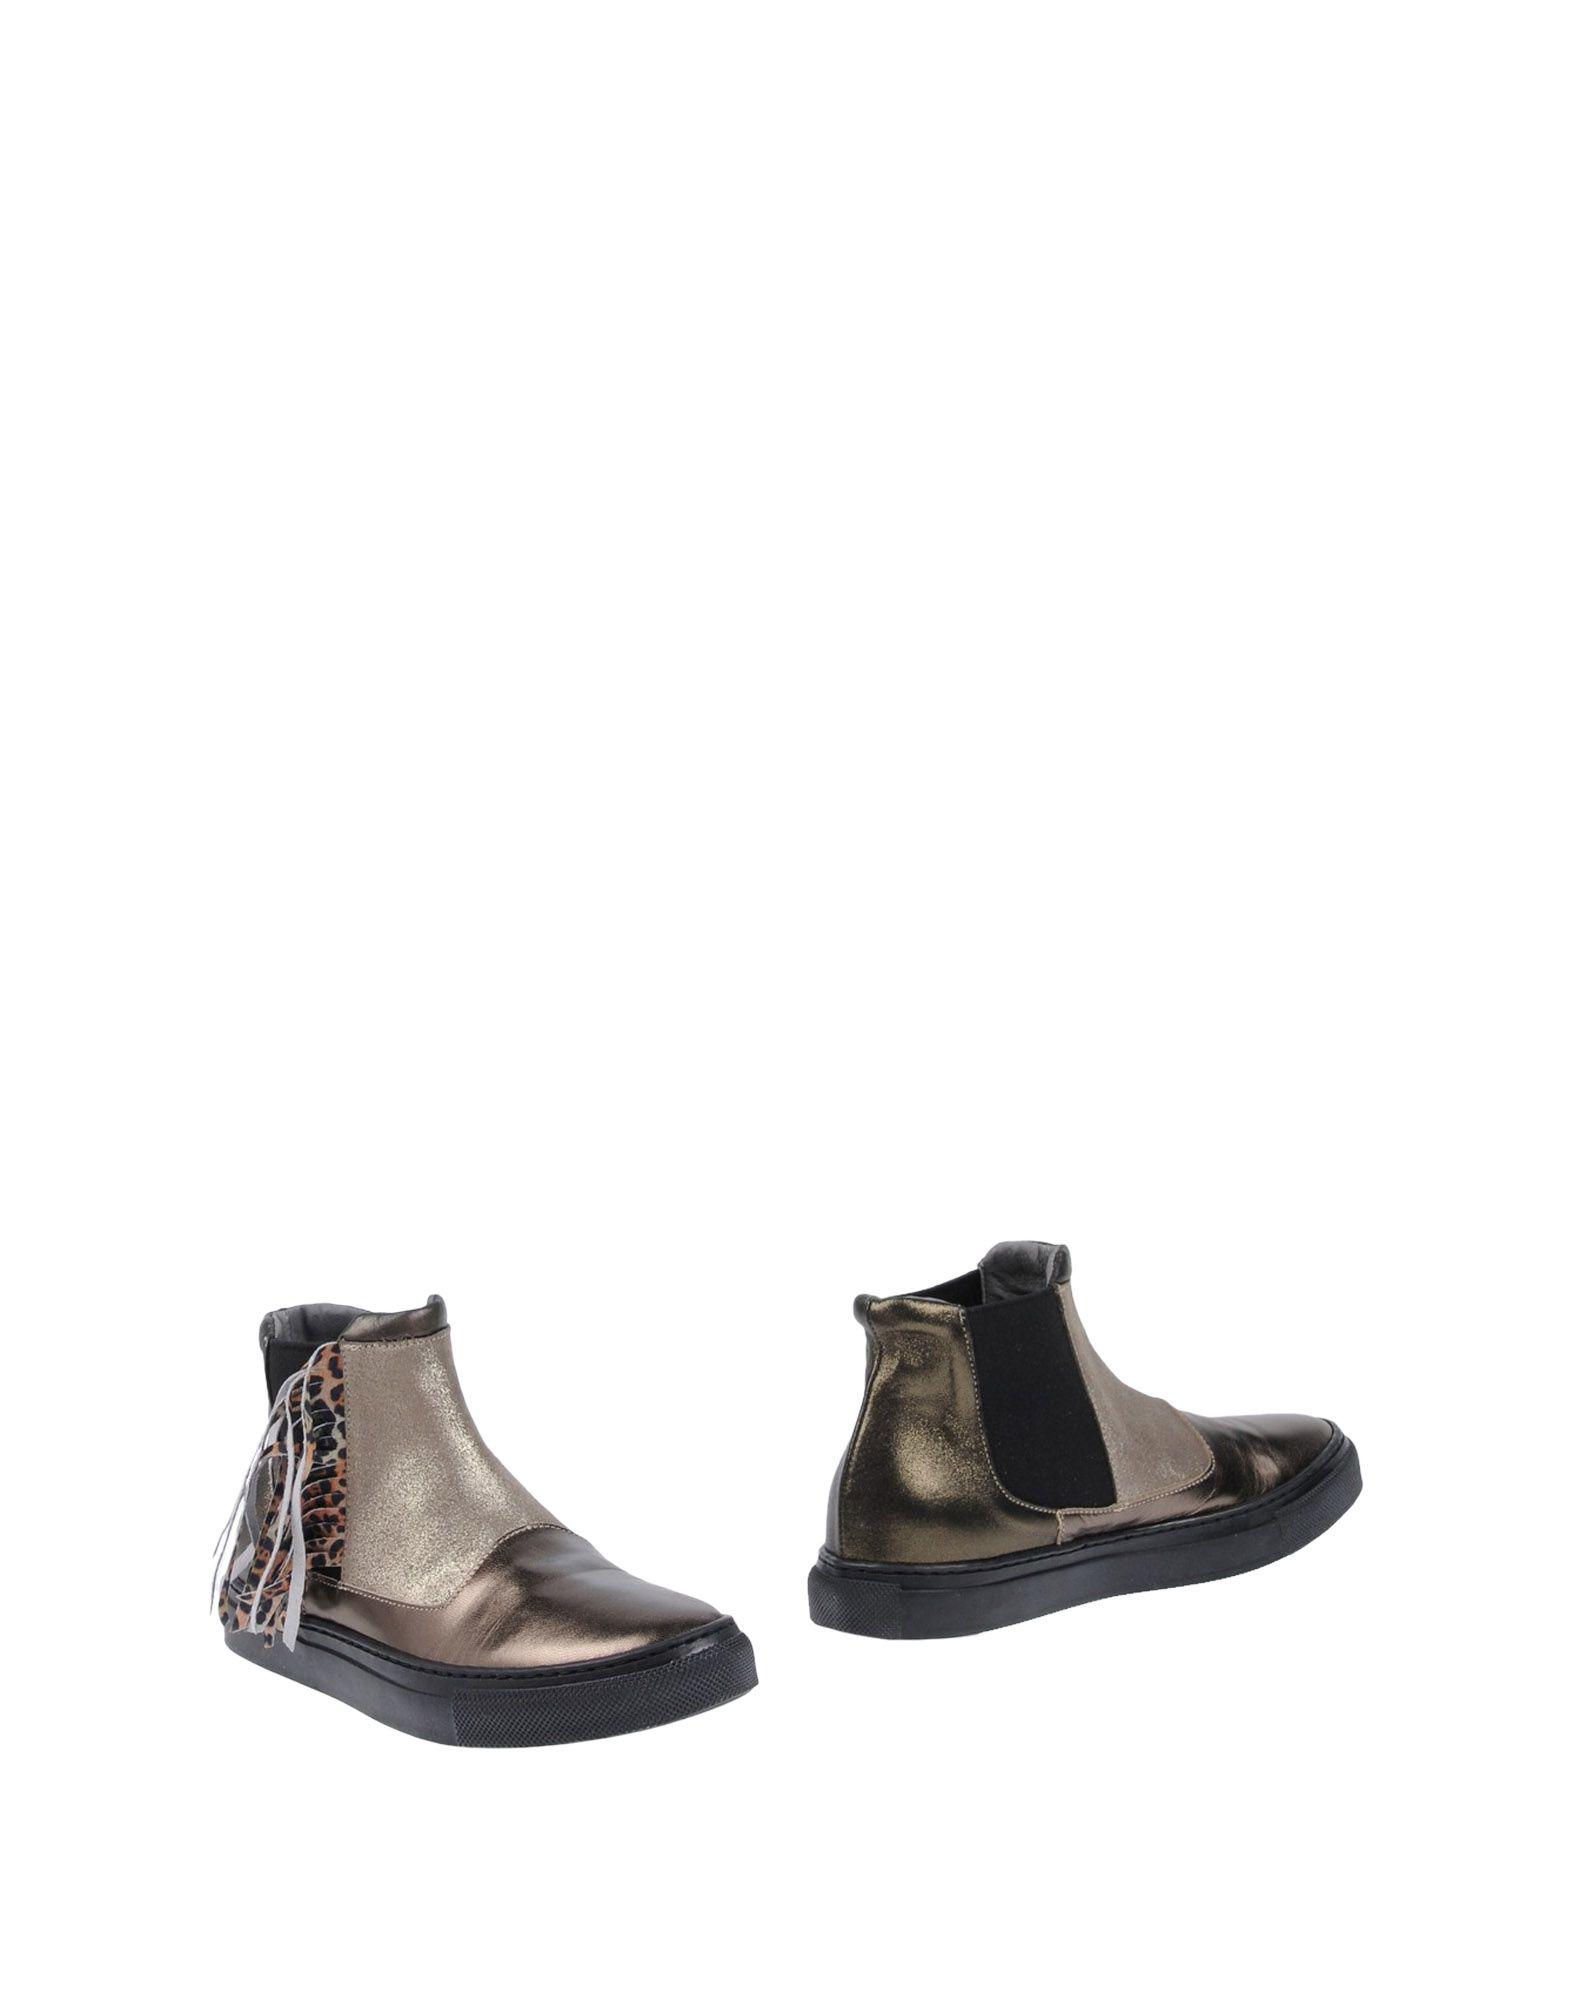 Ebarrito Ankle Boot - Women Ebarrito  Ankle Boots online on  Ebarrito Canada - 11456950RJ 0e269d